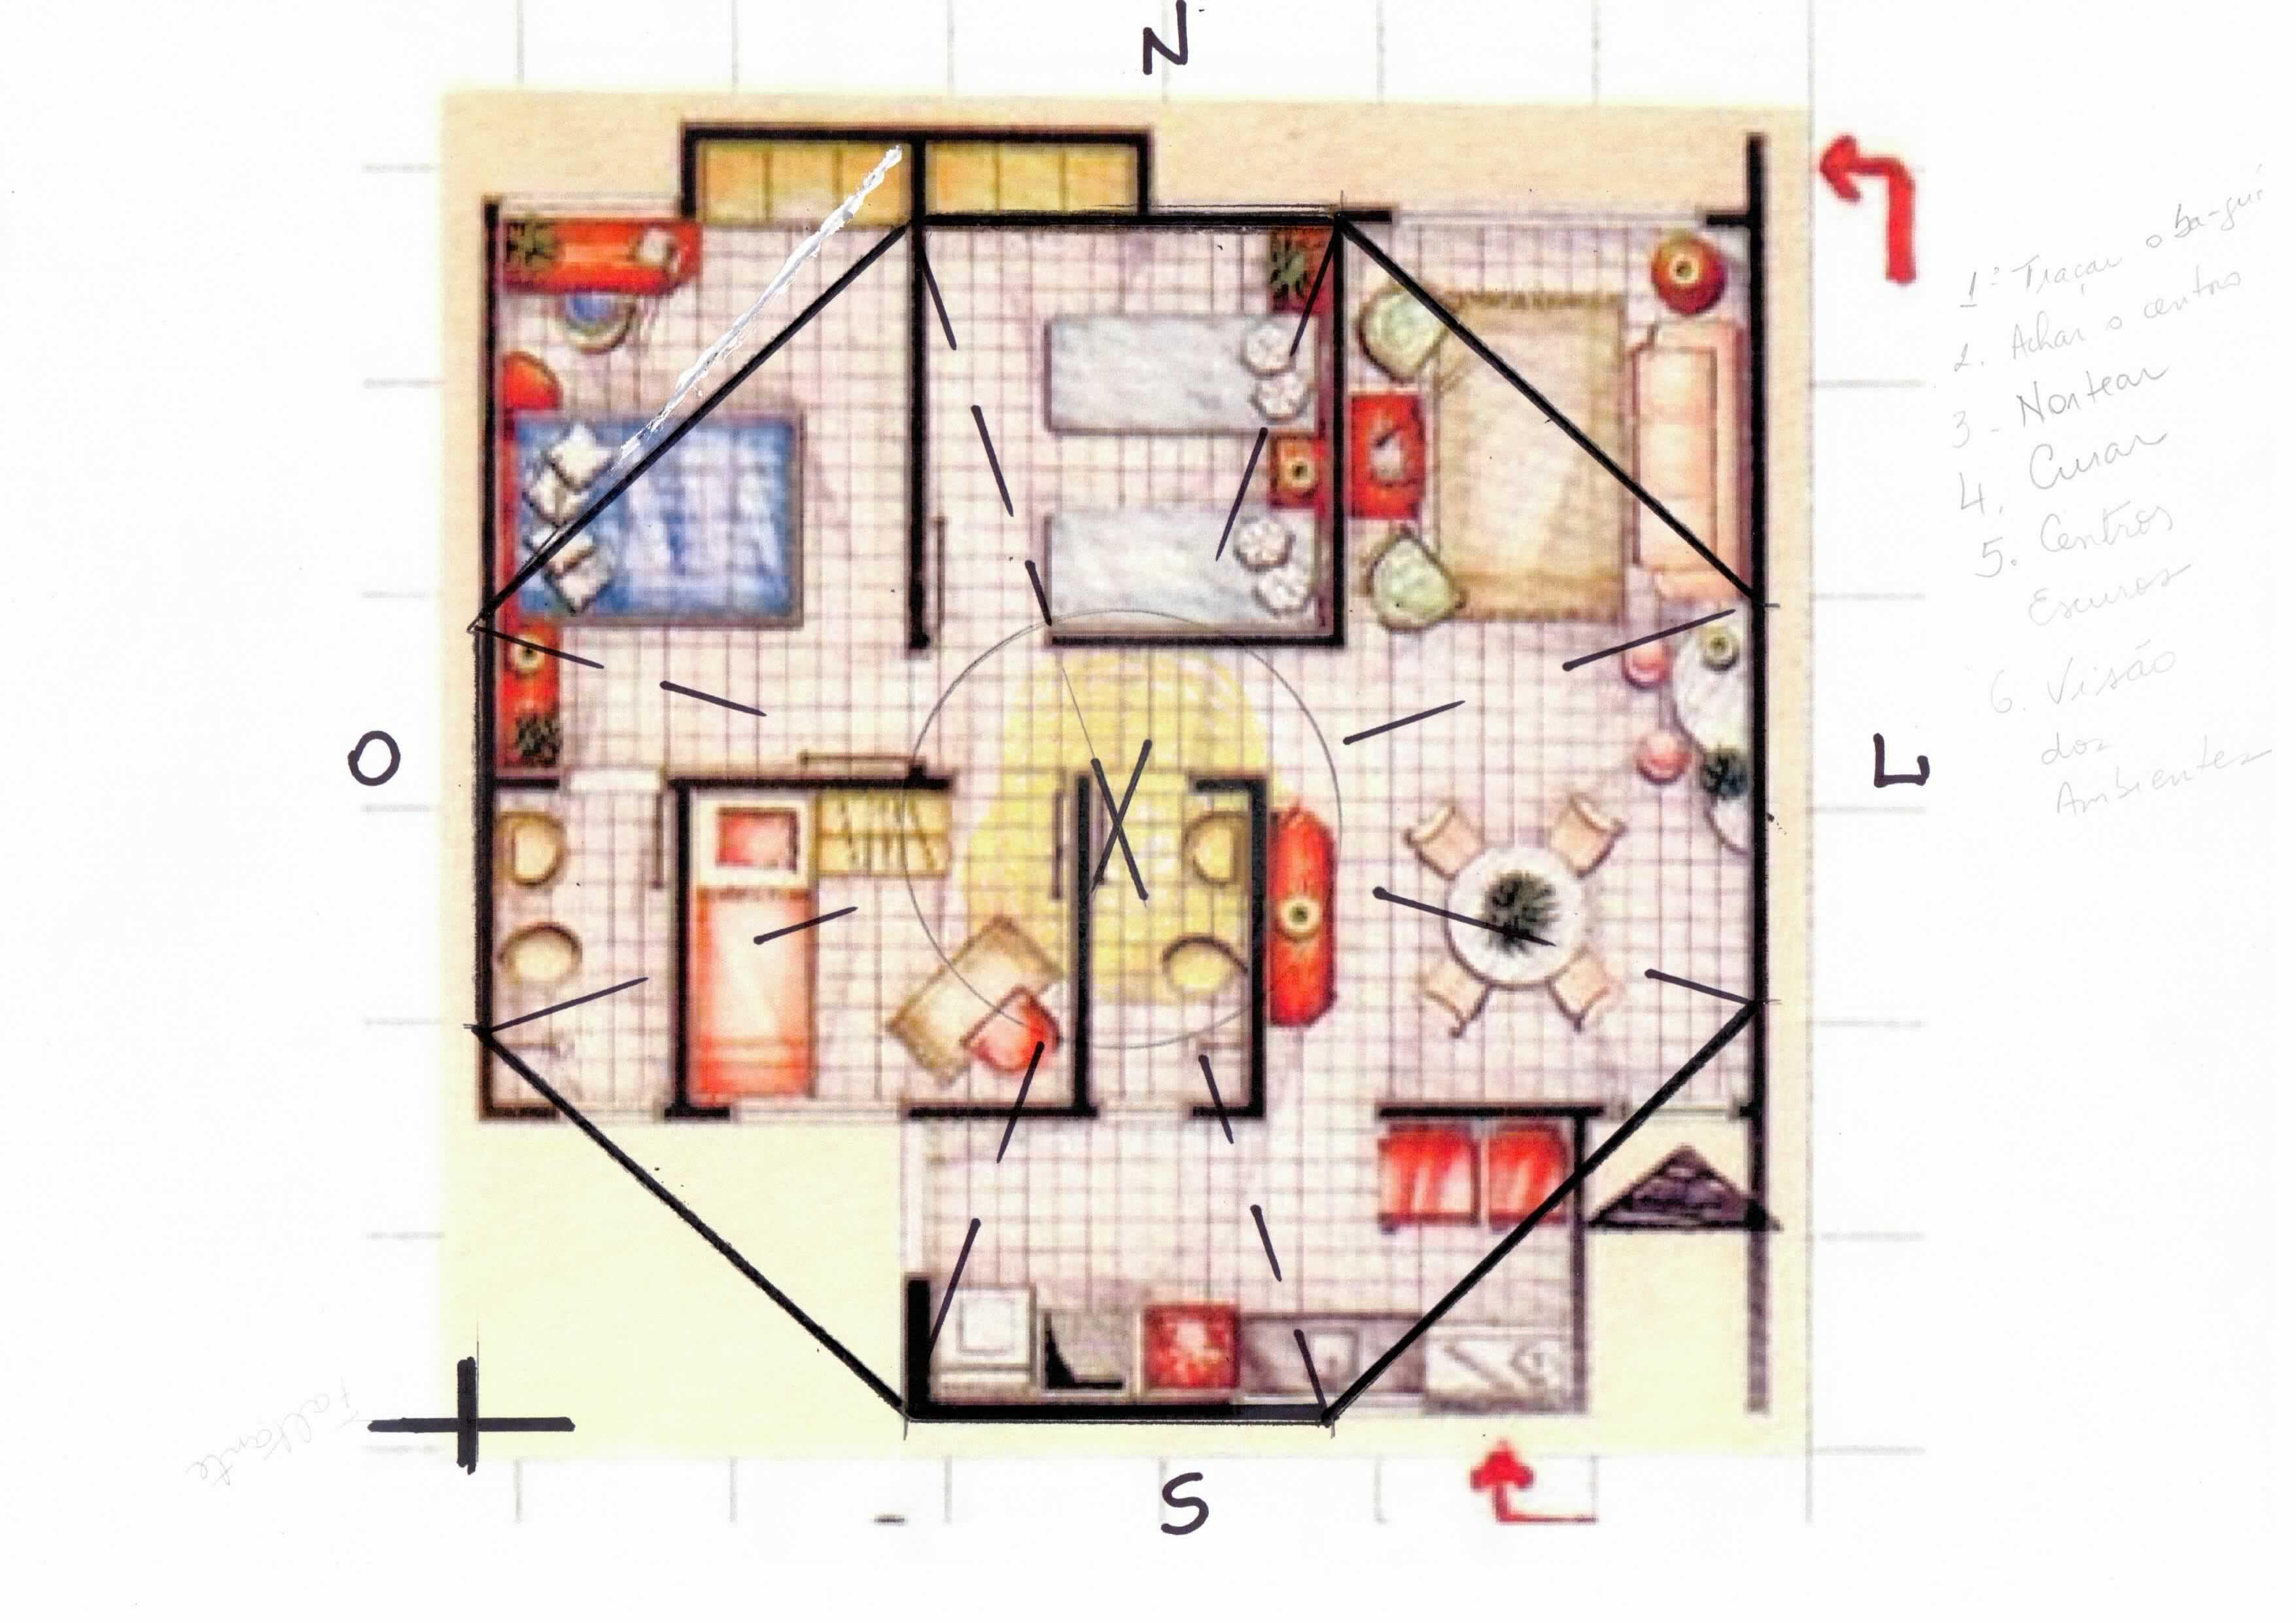 Se tiver dúvidas coloque a bússola no centro da residência ou  #A62A25 3510 2481